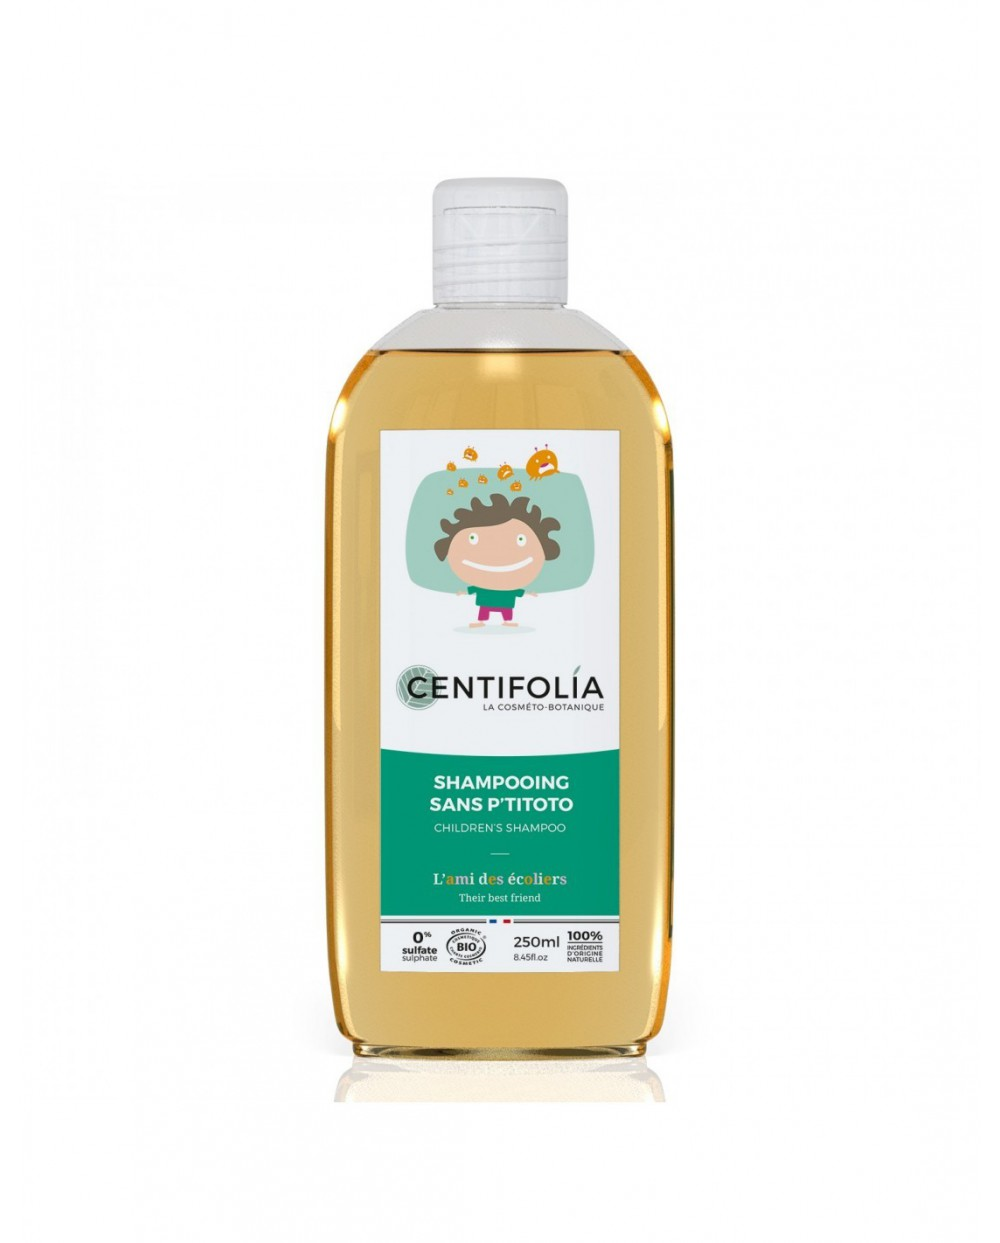 "Centifolia - Shampoo anti-pidocchi ""sans p'titoto"" 250ml"